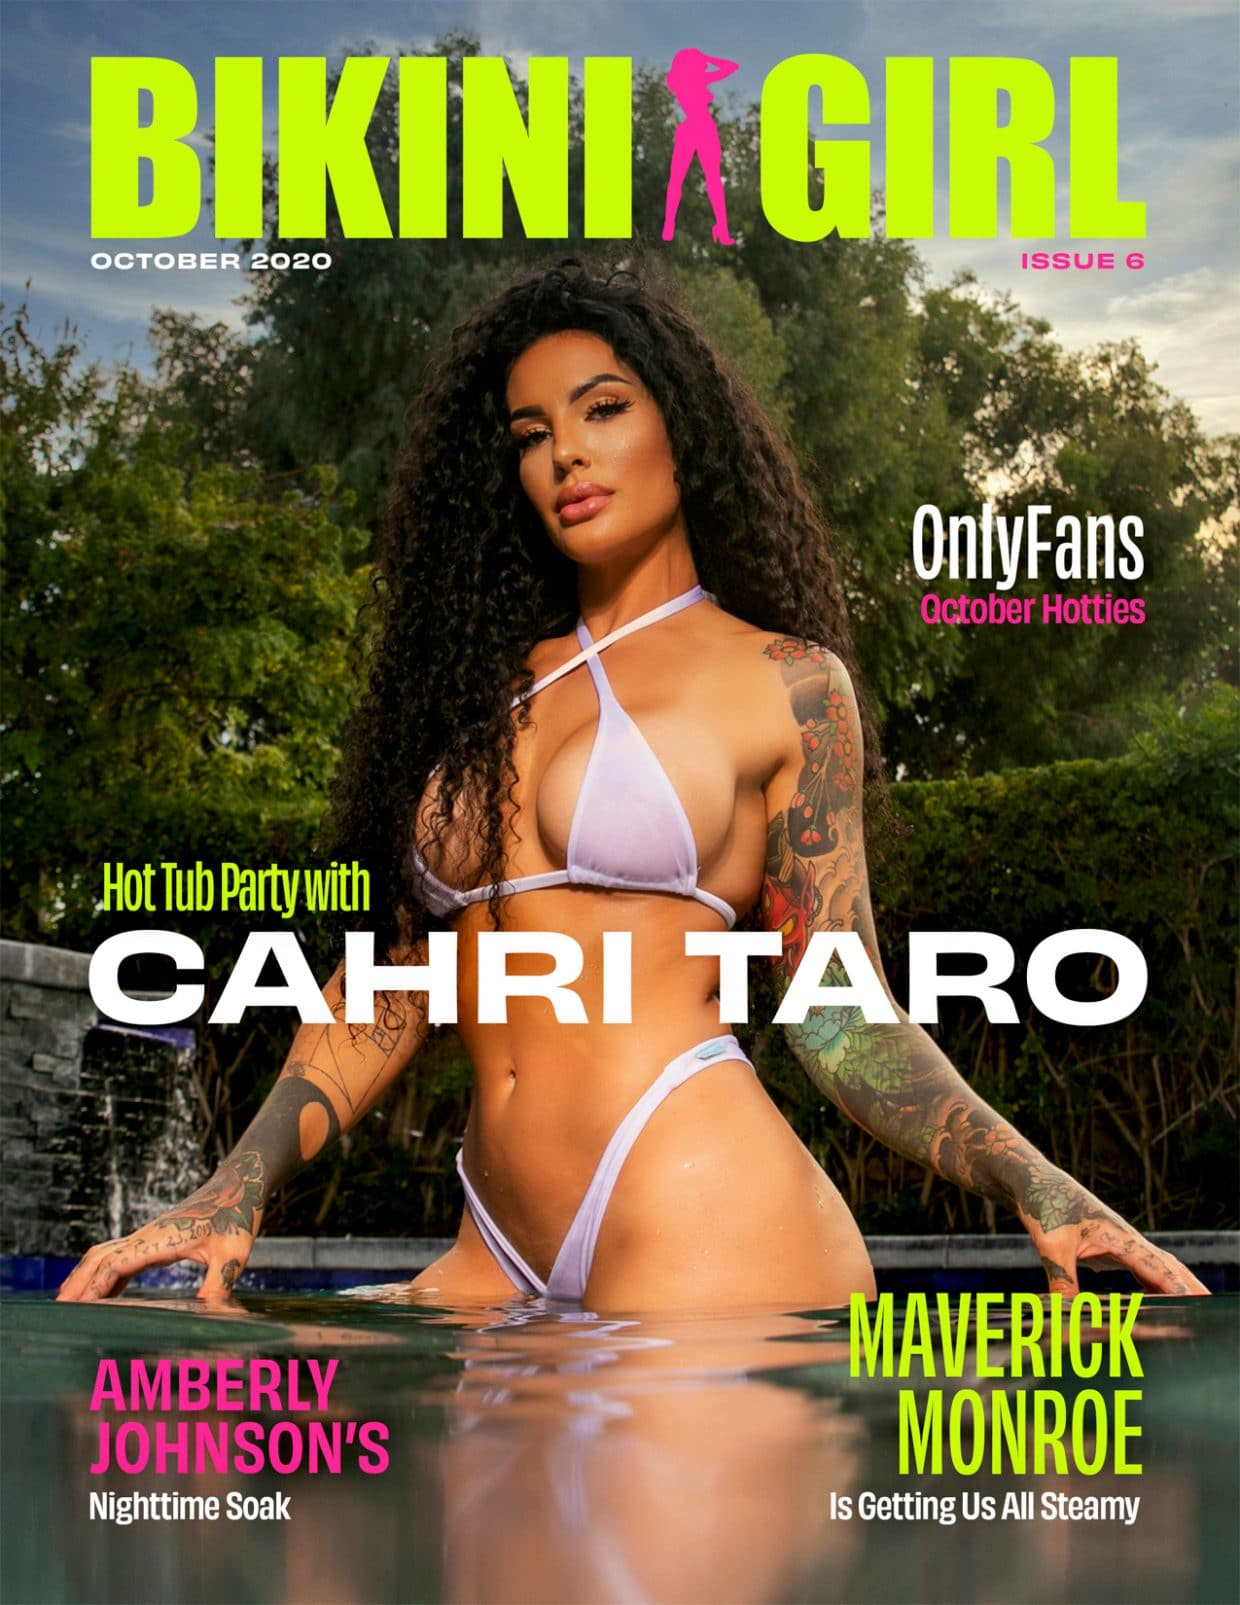 Bikini Girl - October 2020 - Cahri Taro 1